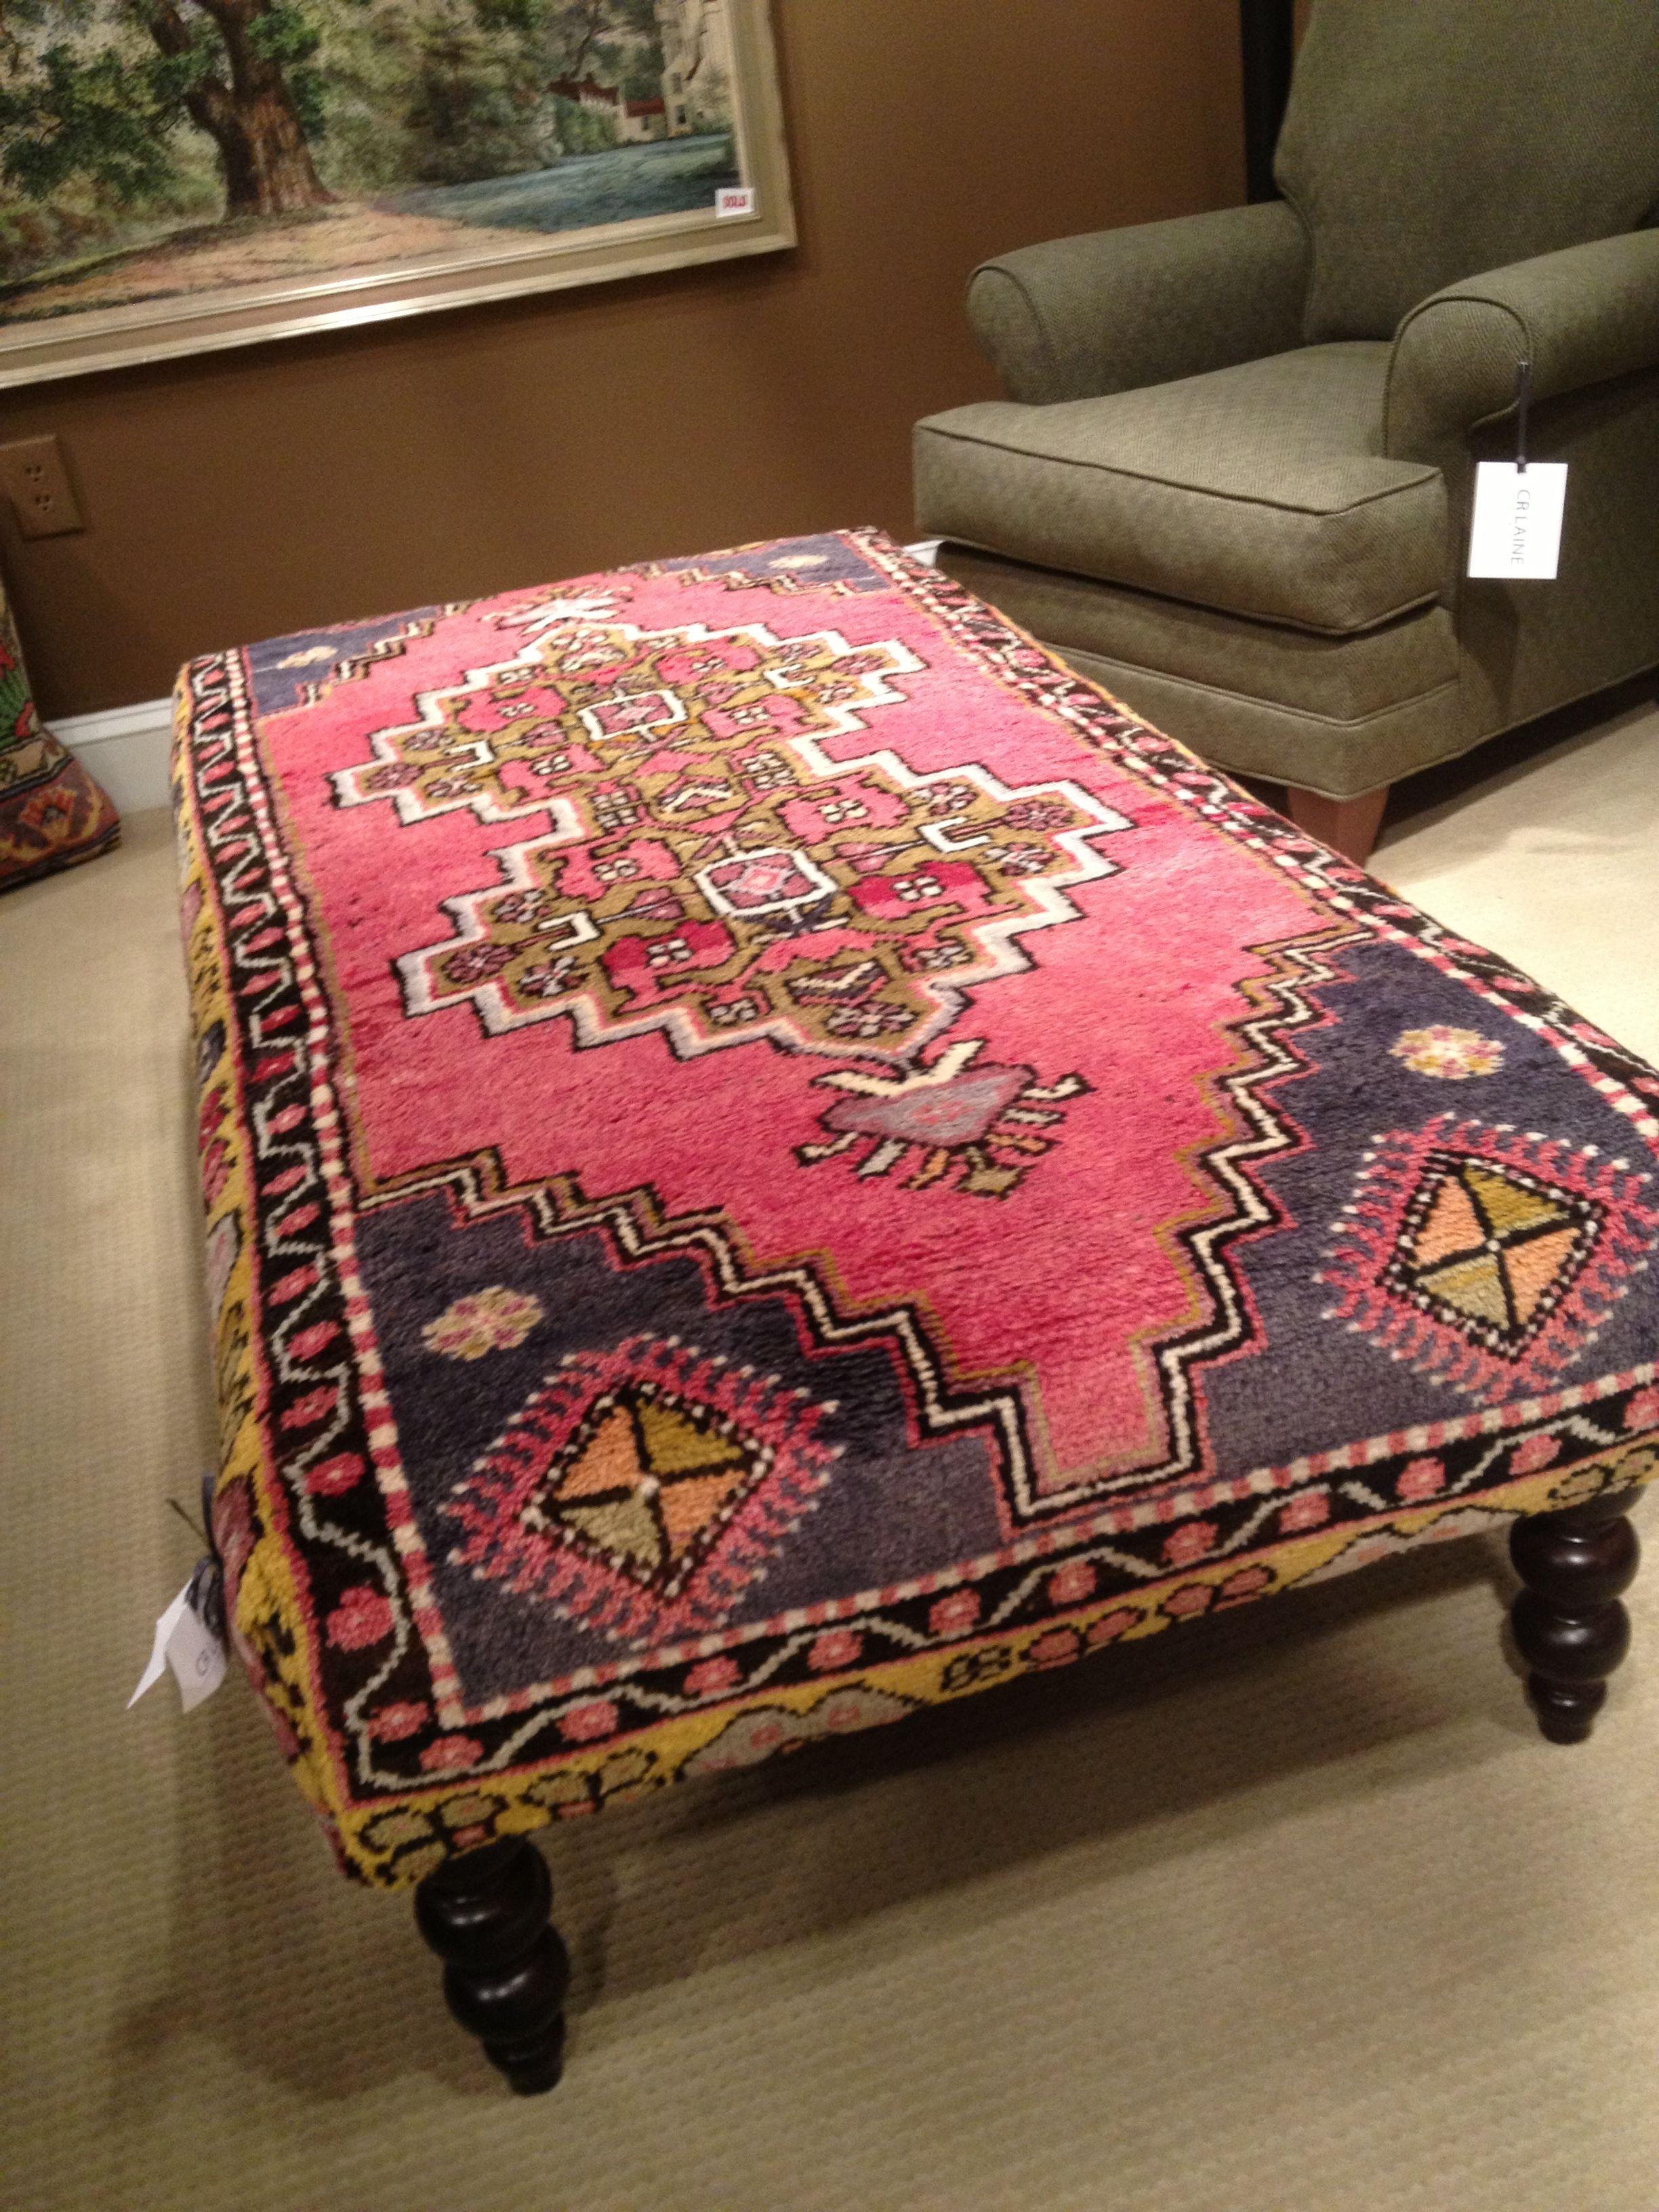 grey fur rug padded bench closet design ideas | Rug upholstered ottoman | Furniture | Pinterest ...